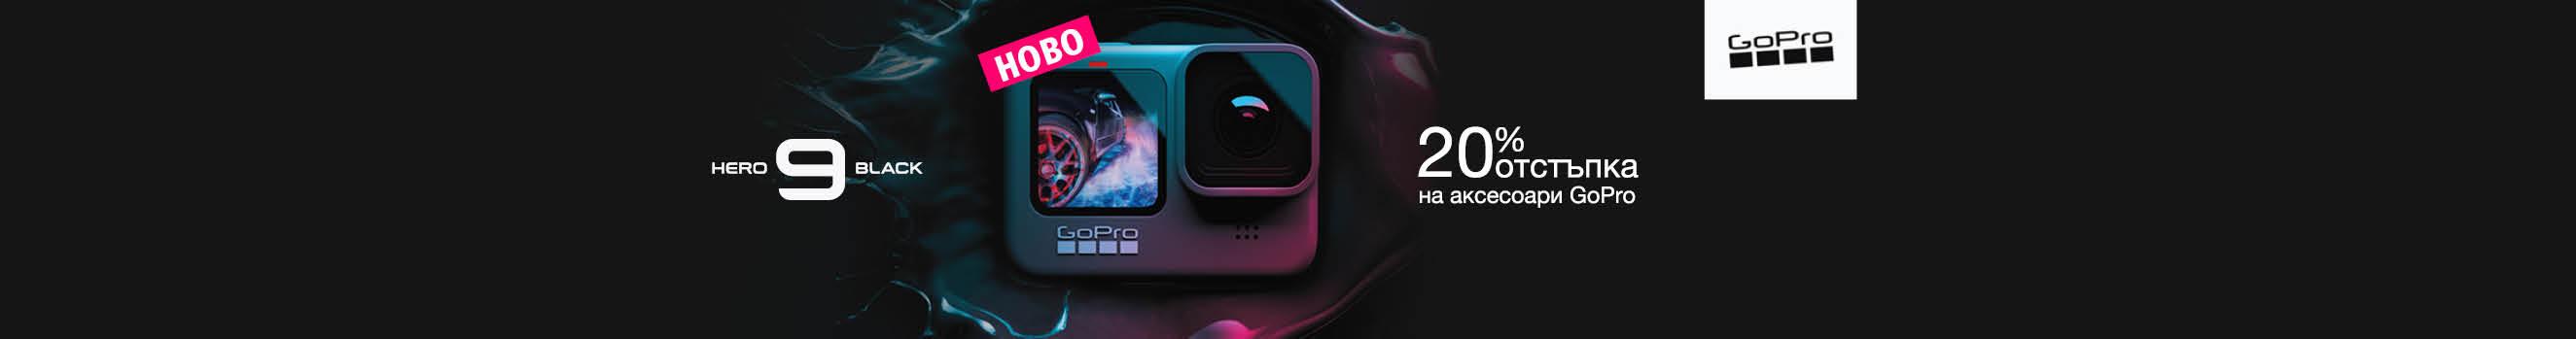 GoPro HERO9 Black Action Cam + 20% Discount on Accessories